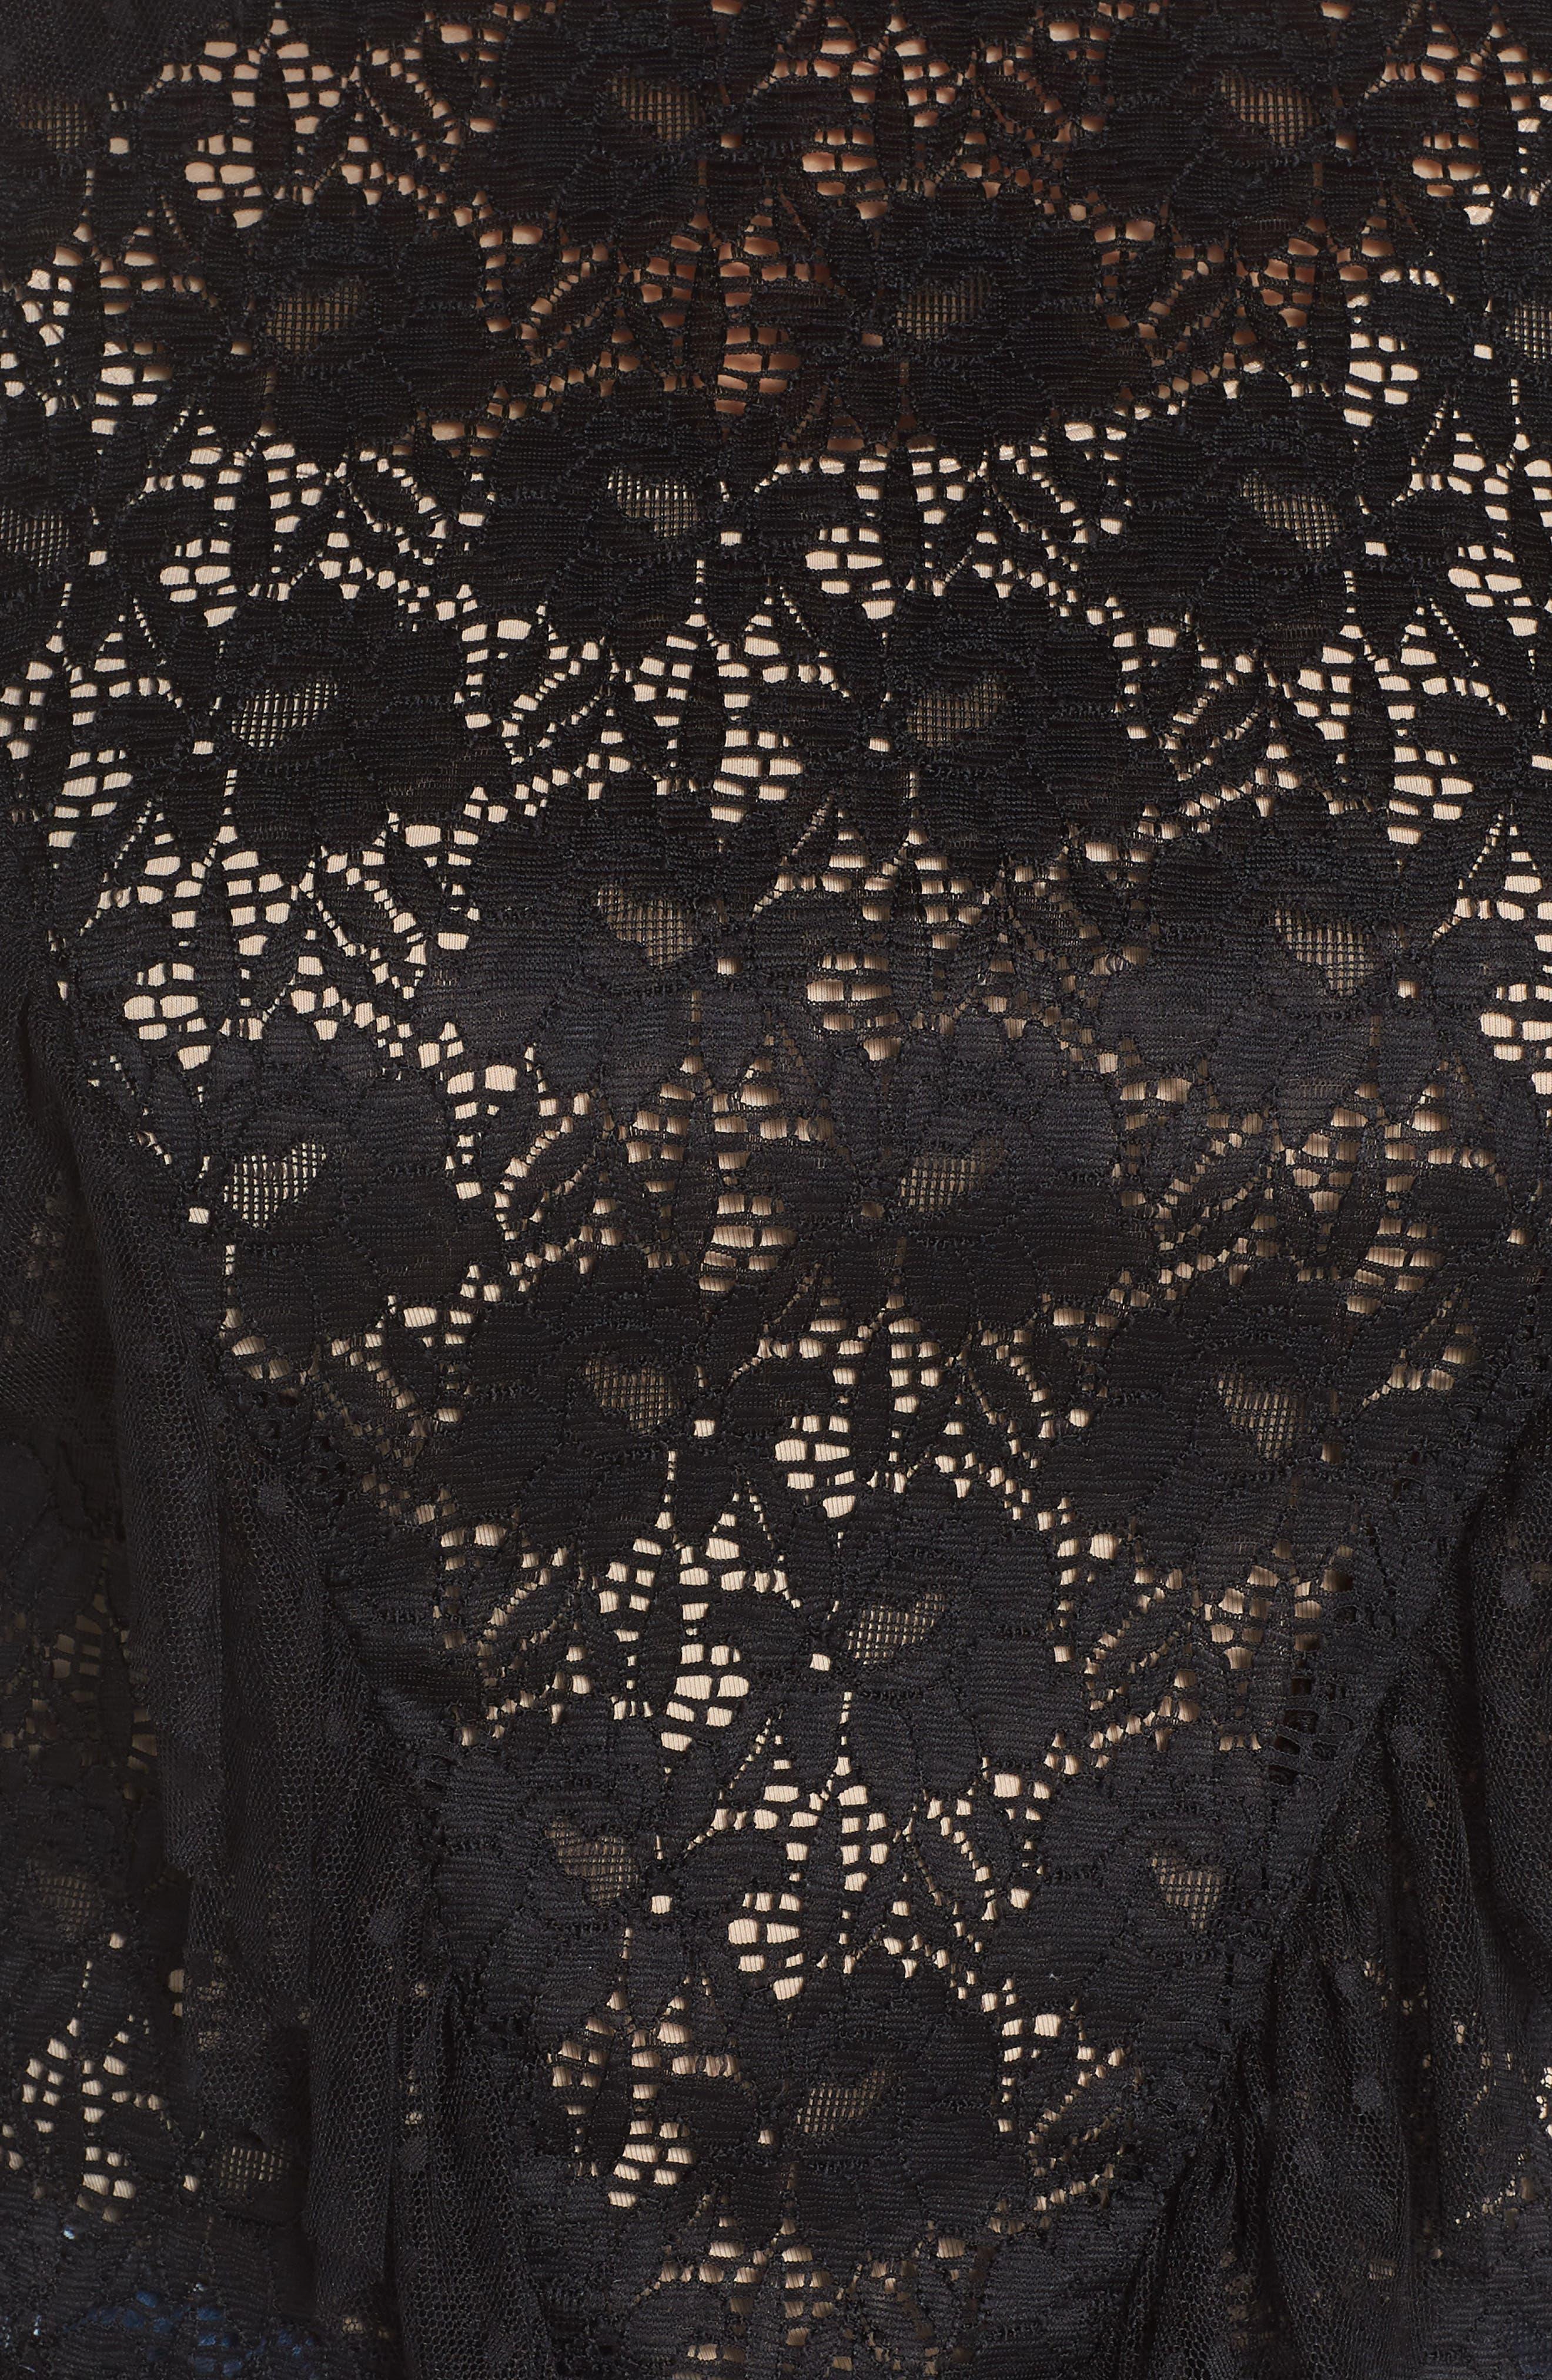 Ruffle Trim Lace Top,                             Alternate thumbnail 6, color,                             Black